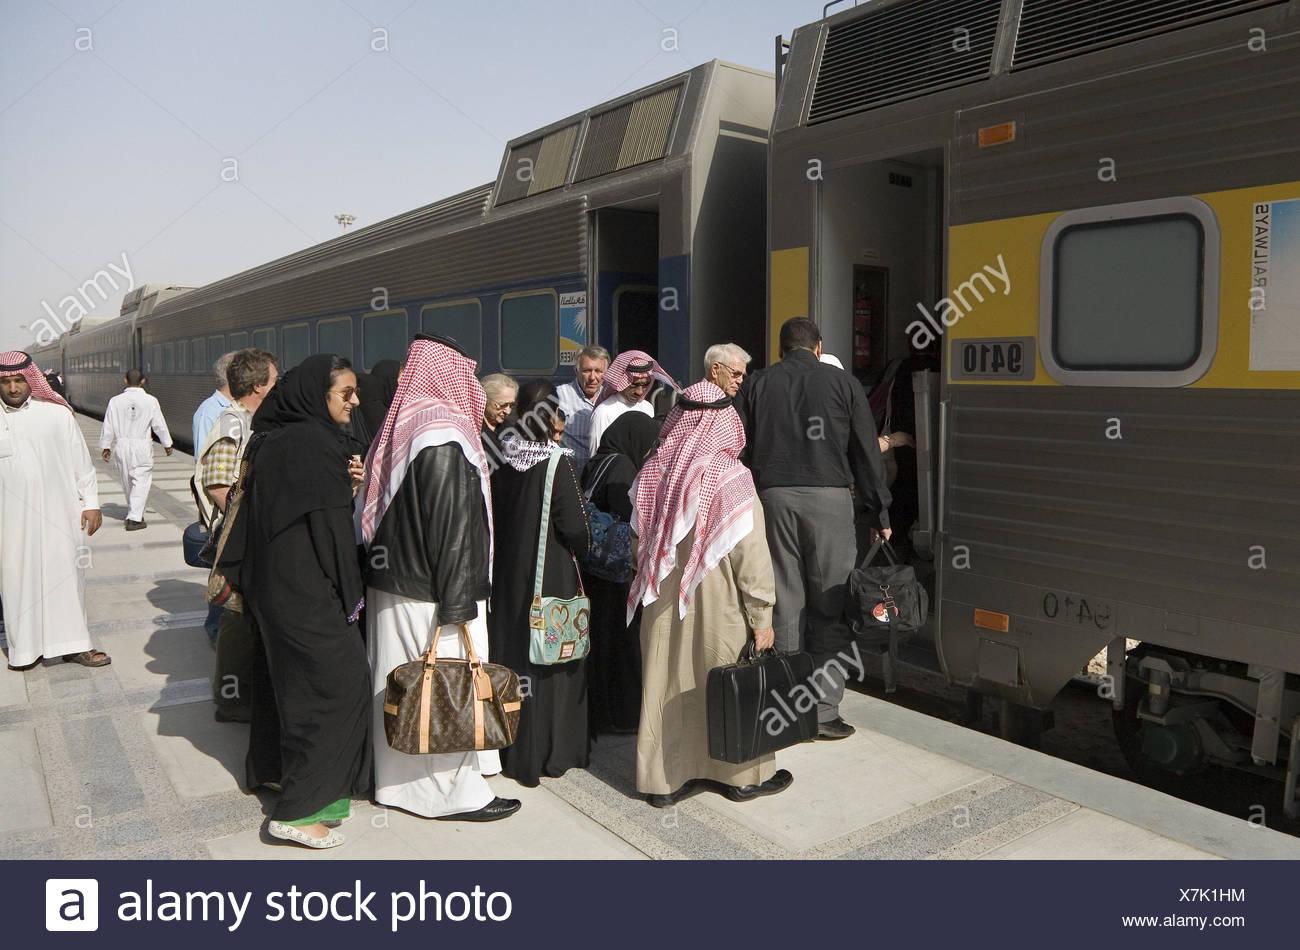 Saudi Arabia, railway station, platform, passengers, - Stock Image